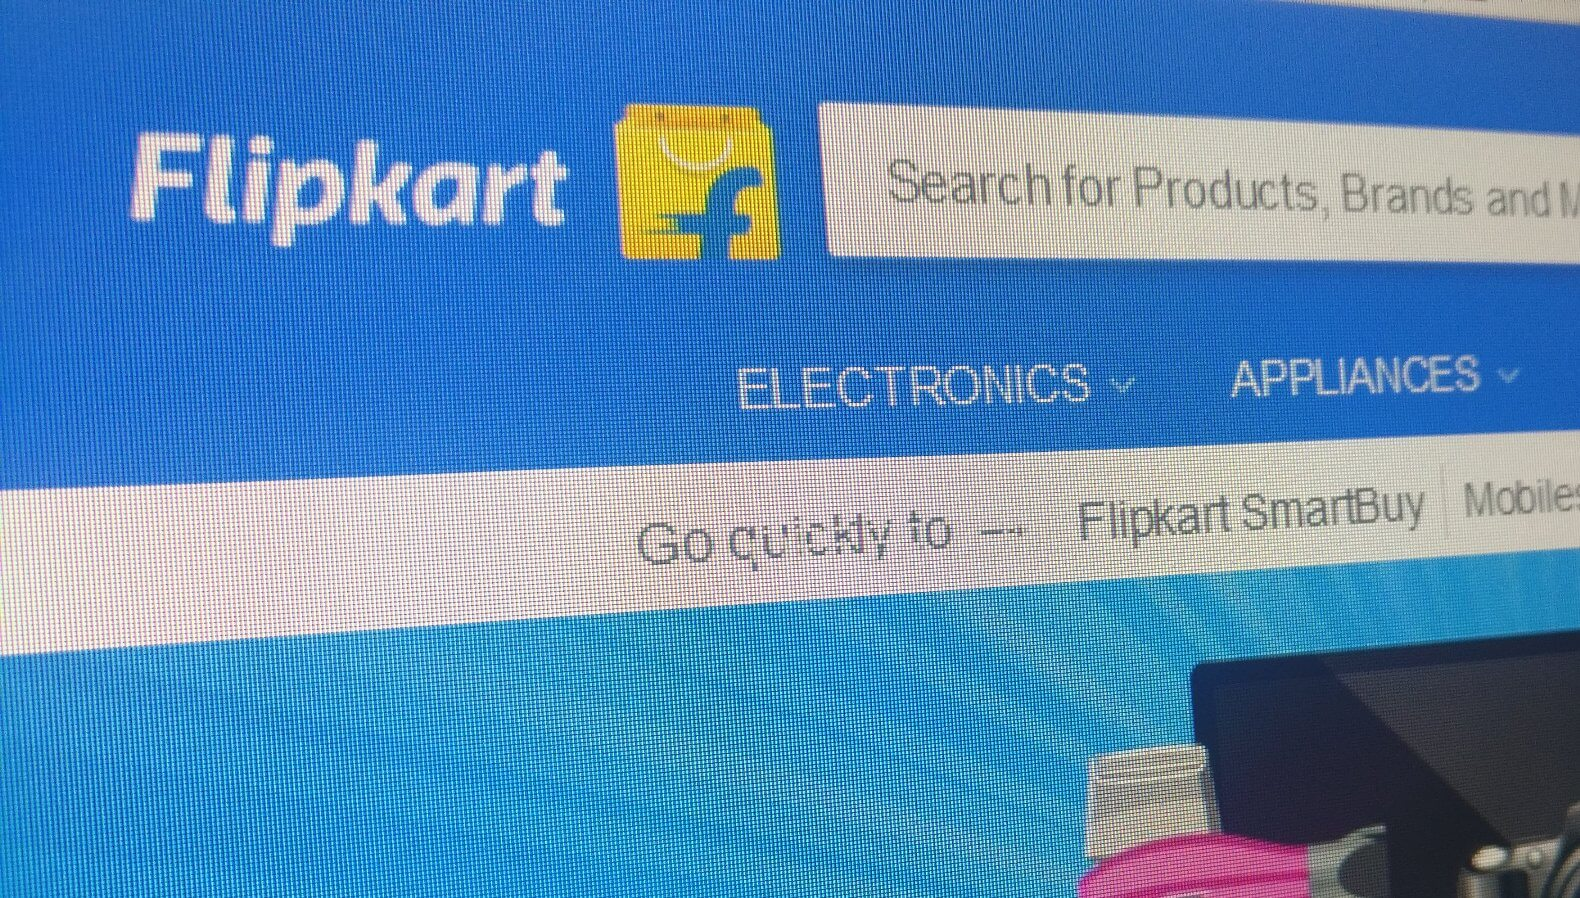 Walmart in talks to buy more than 40% of Flipkart